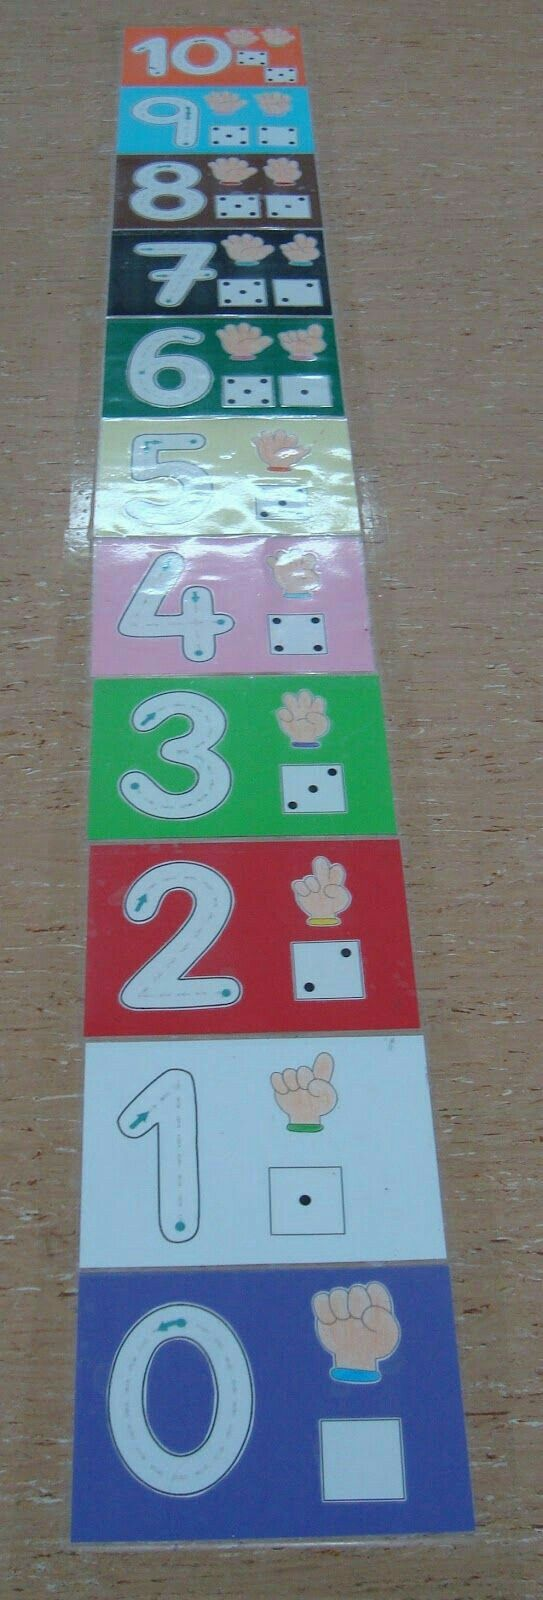 Pin by Merche on Pasillos decorados | Pinterest | Math